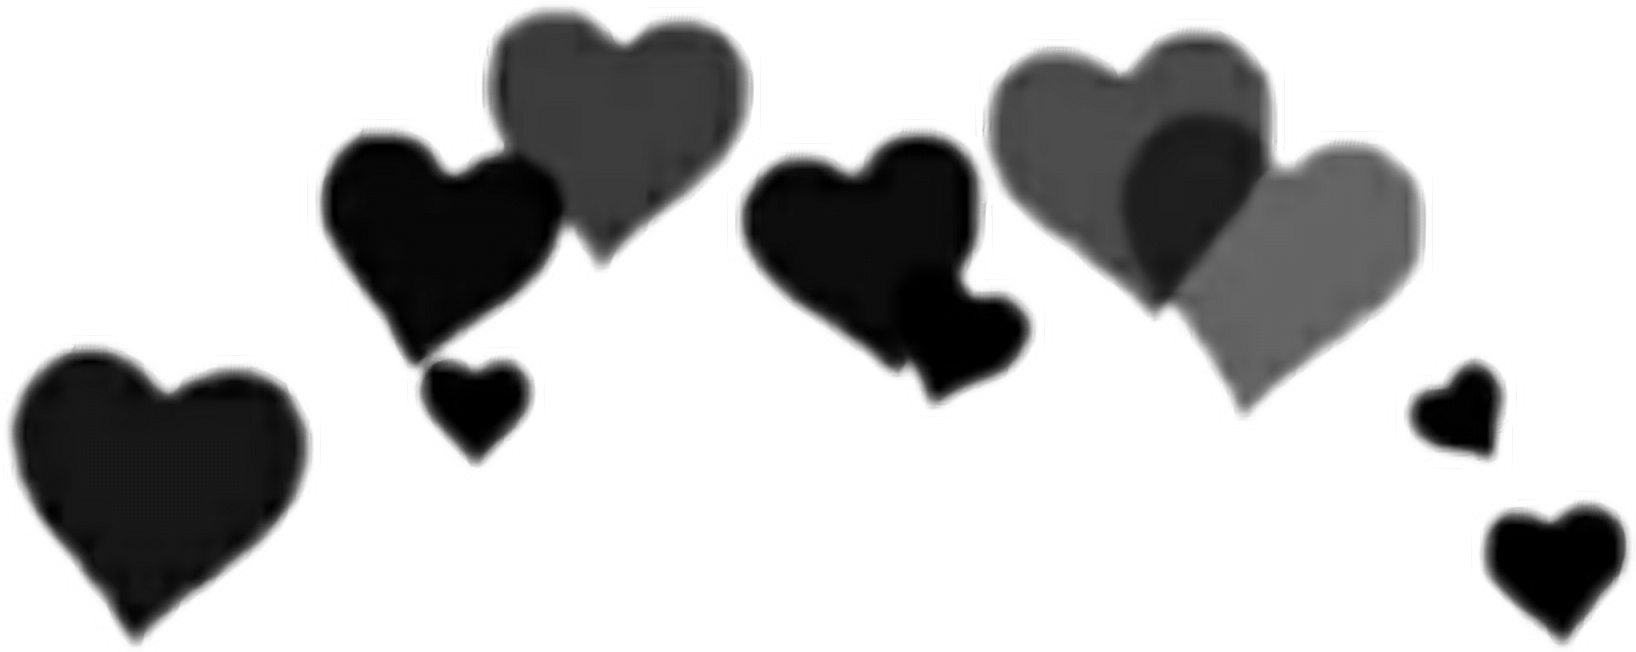 HD Black Heart Crown Png , Png Download.